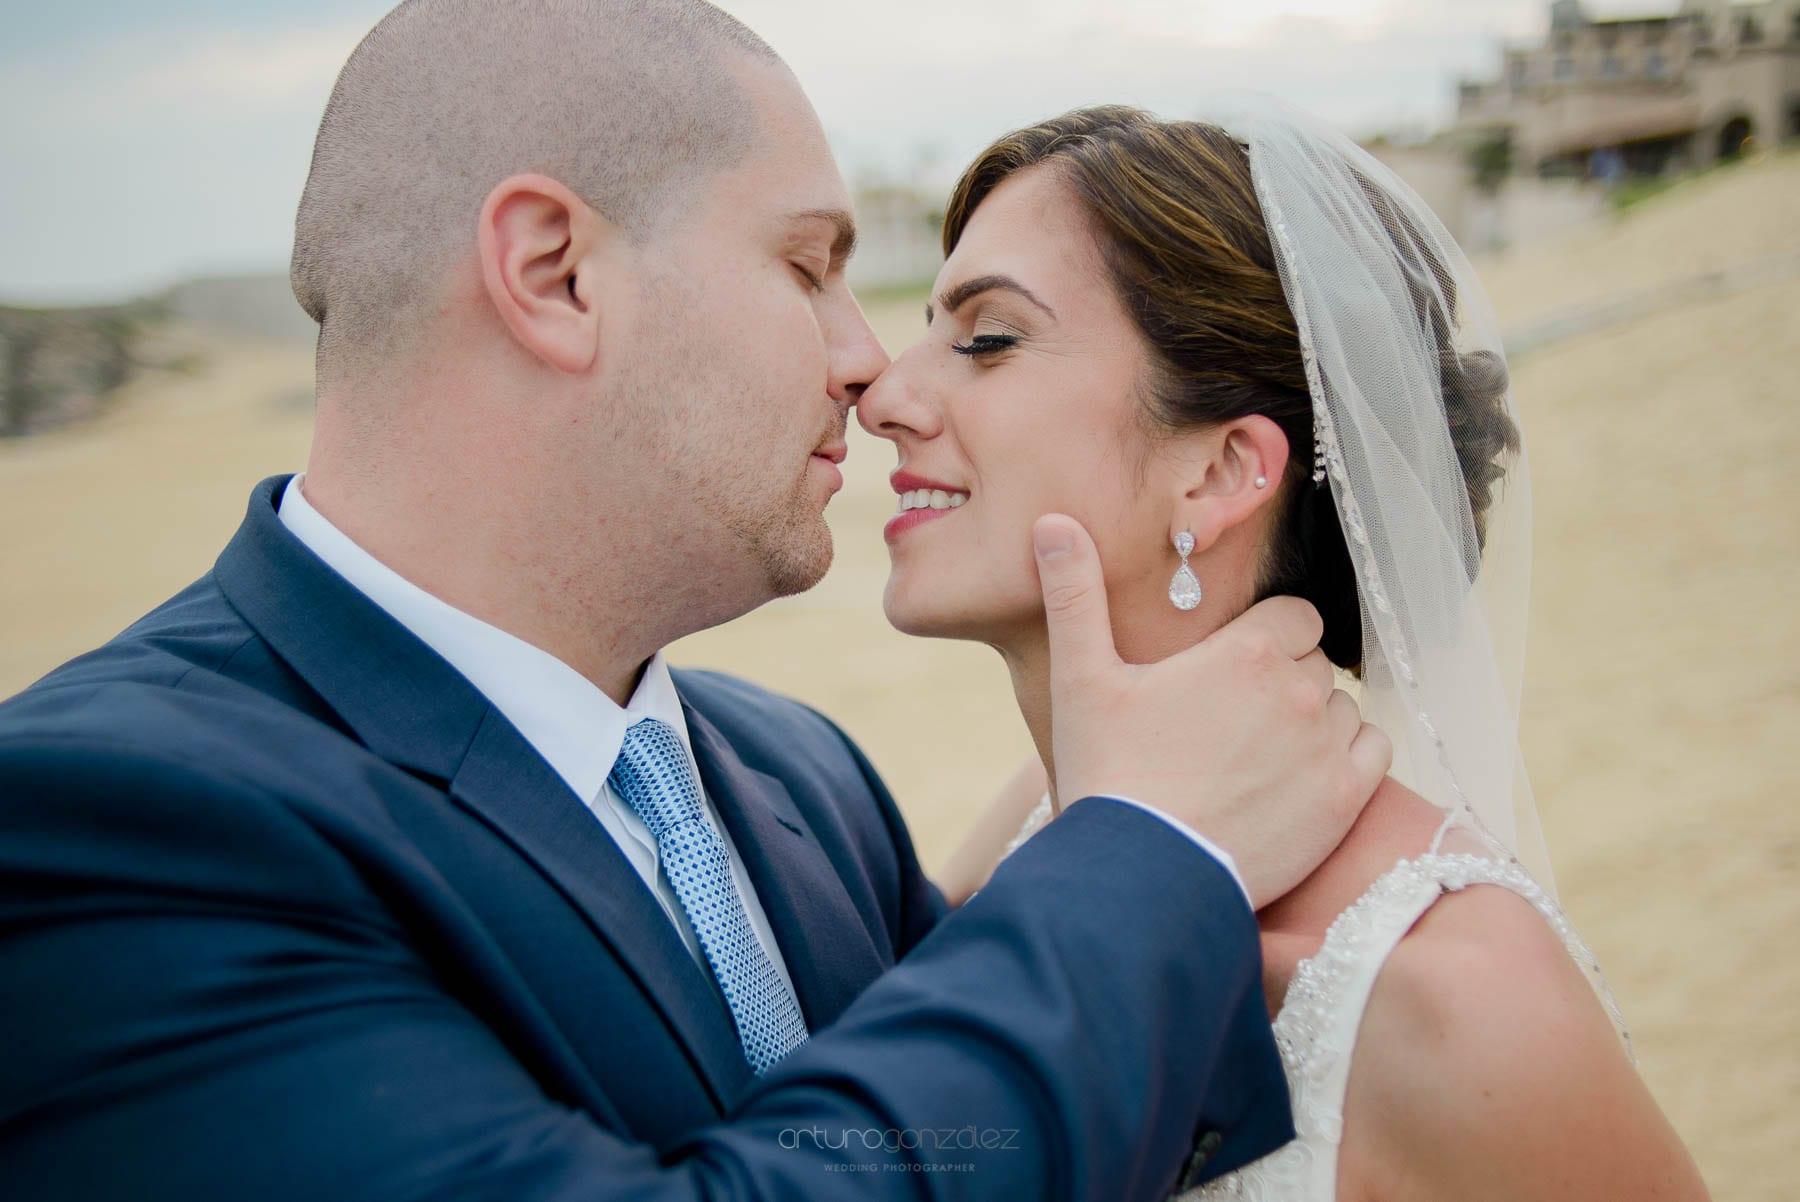 wedding-photos-pueblo-bonito-sunset-beach-4619